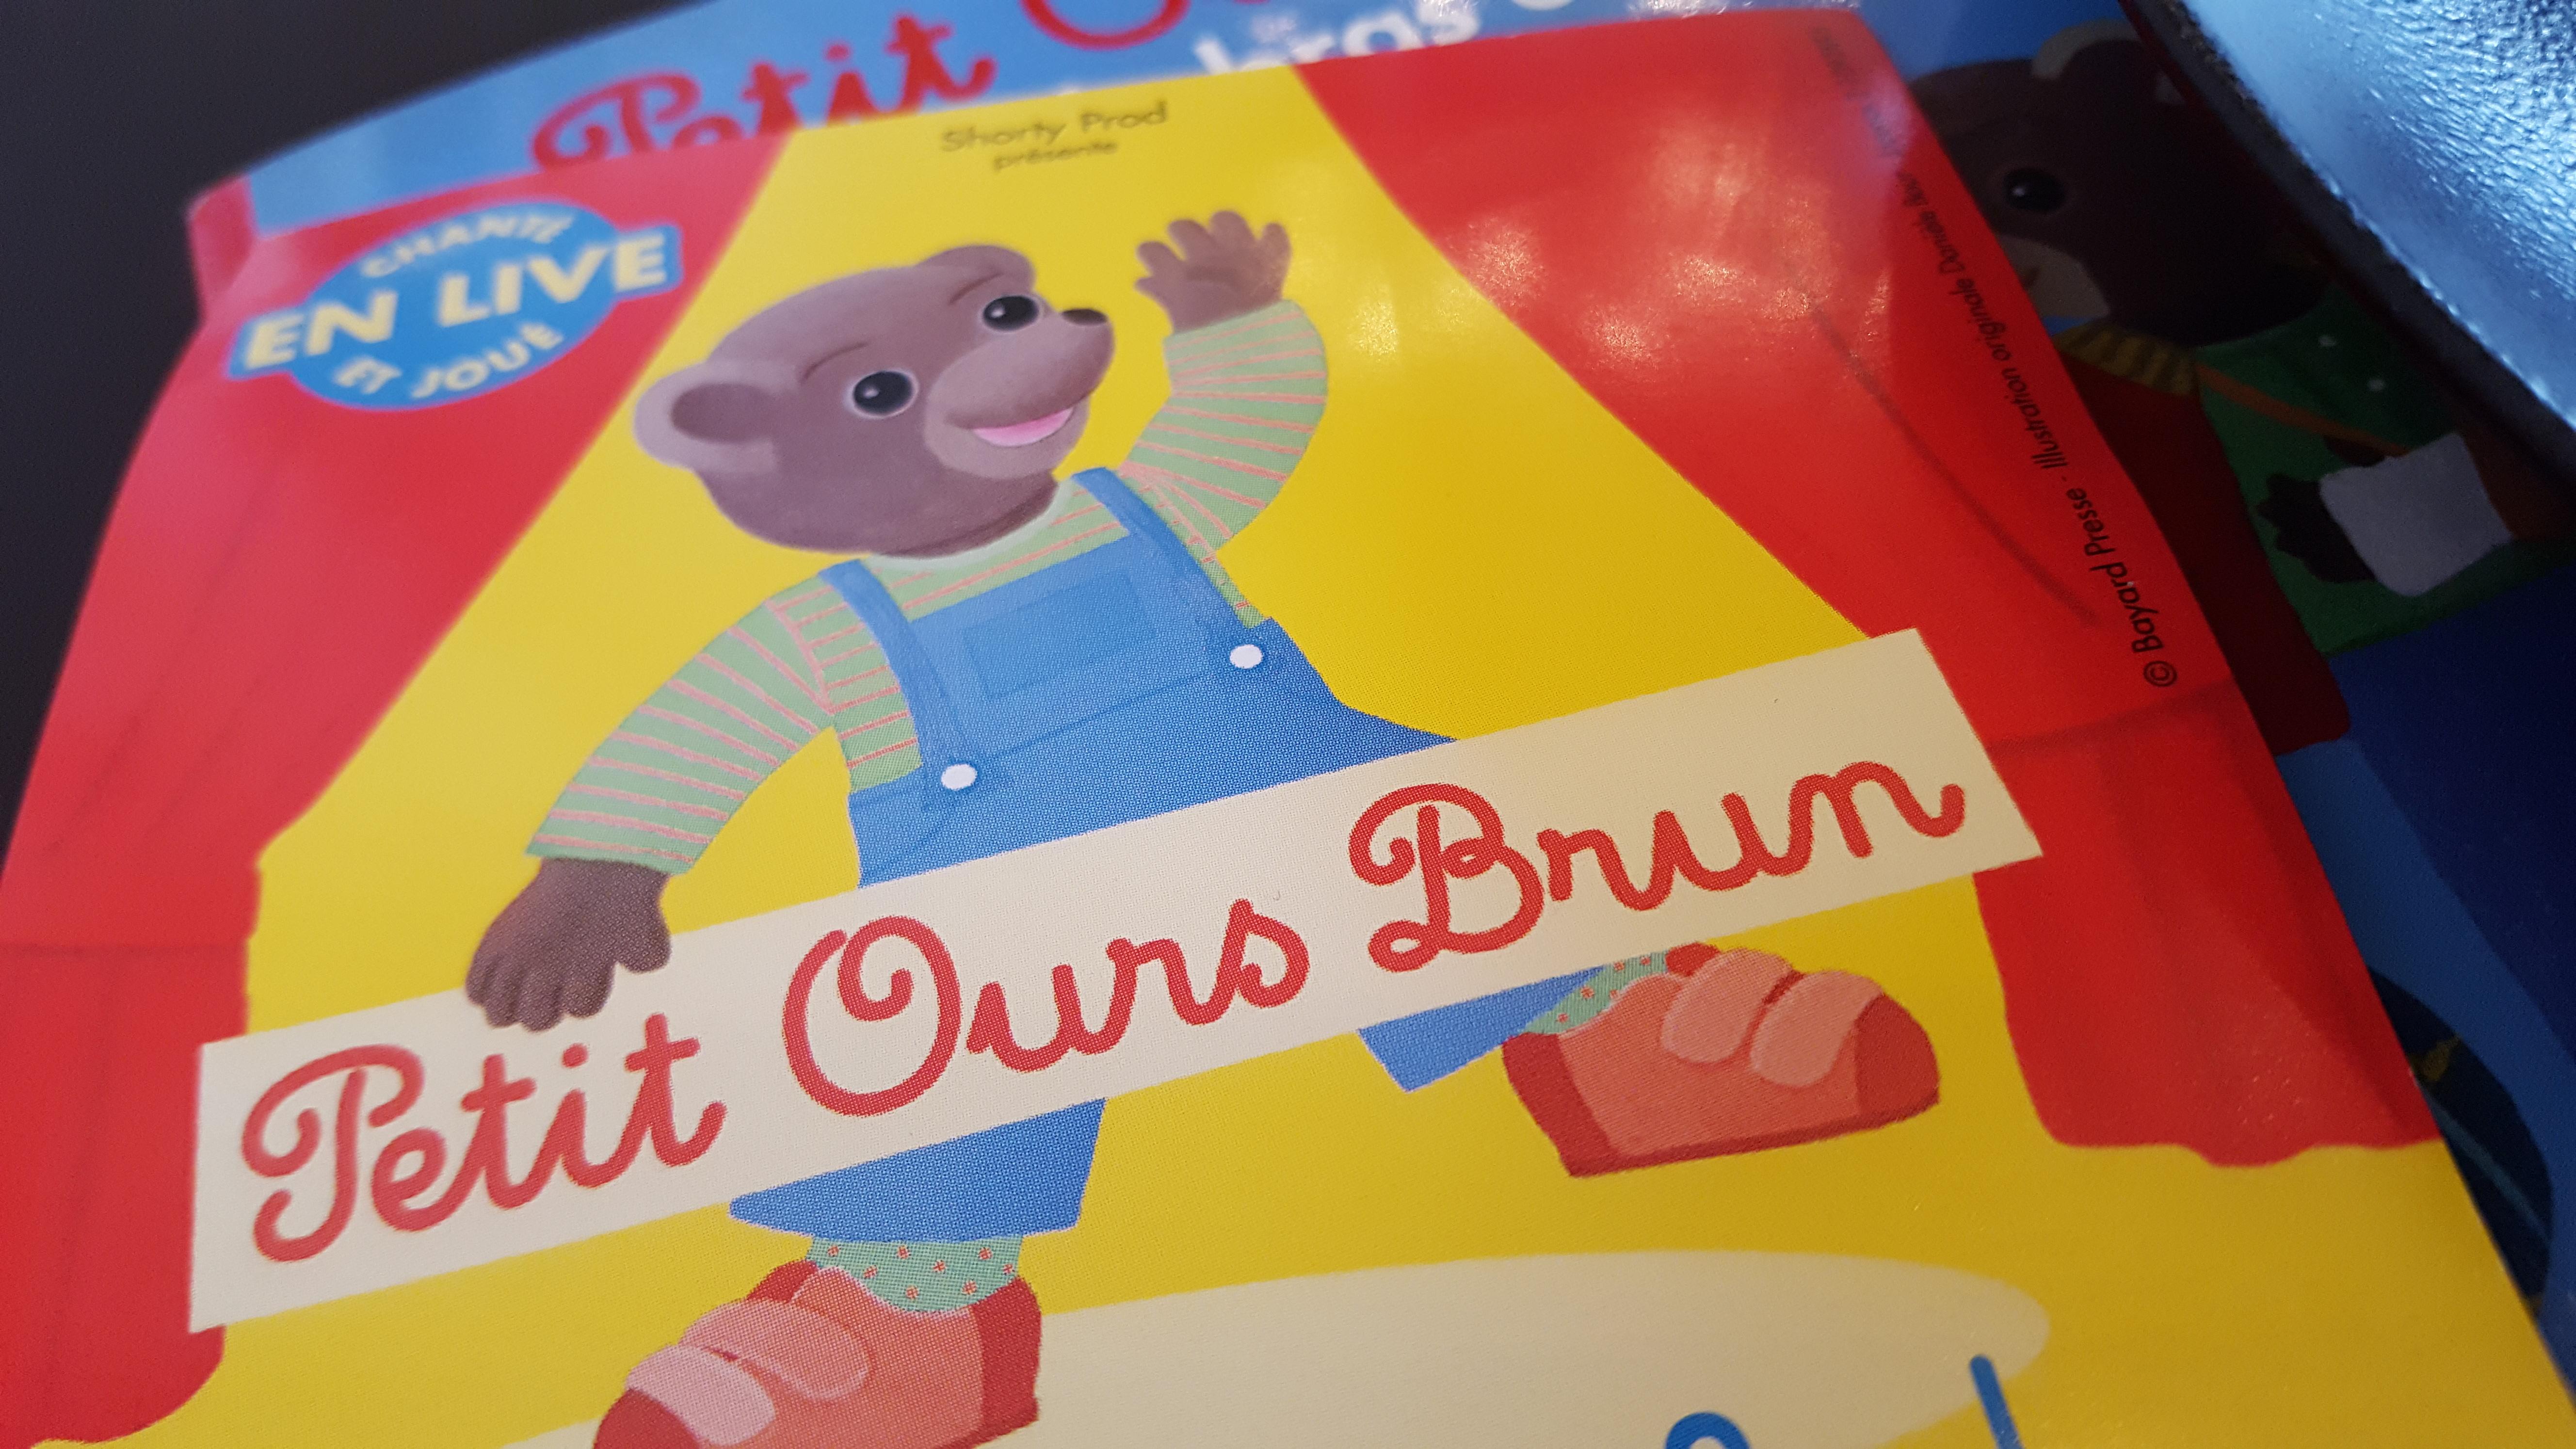 Petit ours brun en pestacle